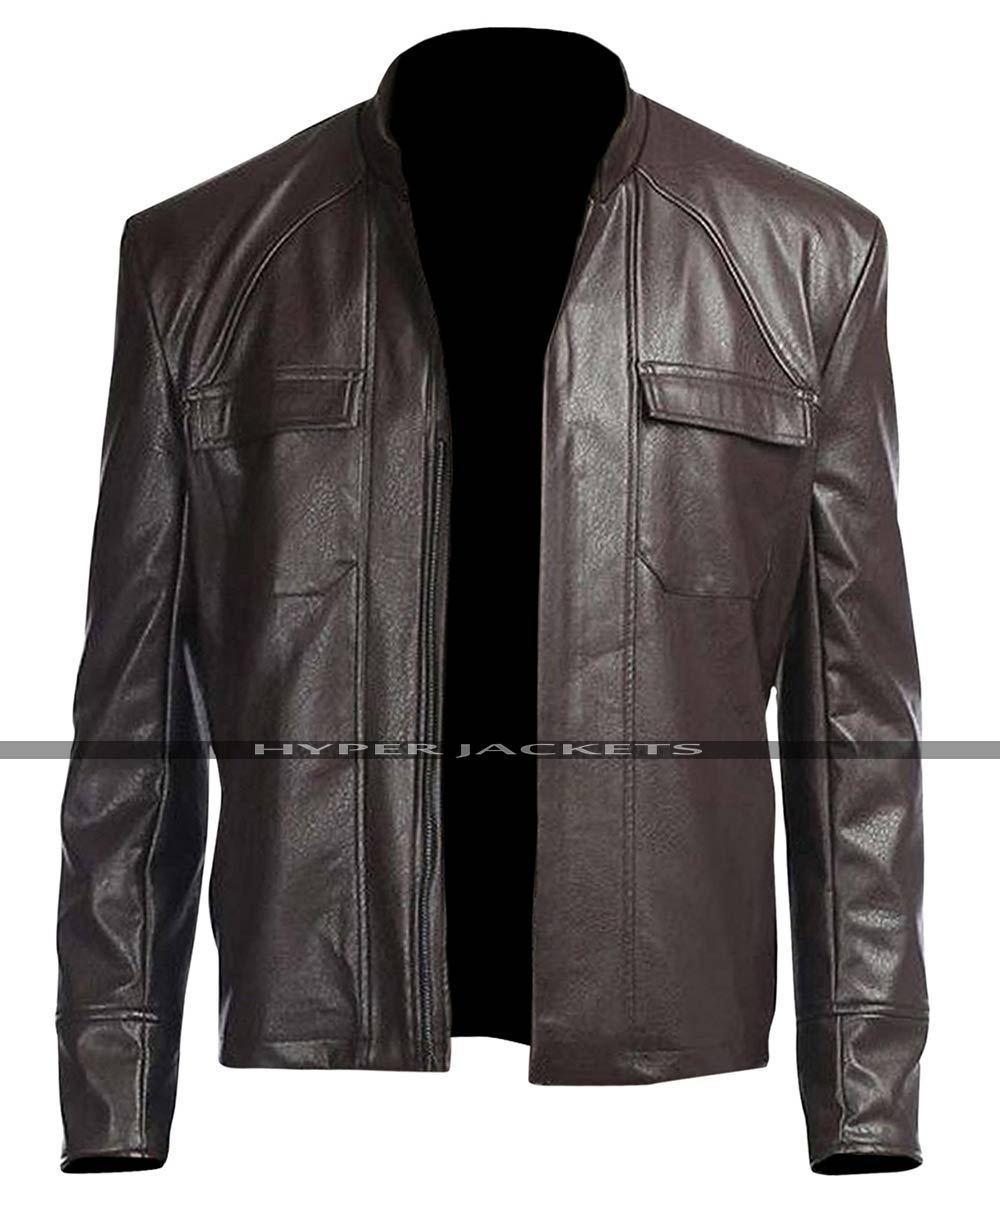 Oscar isaac star wars the last jedi jacket